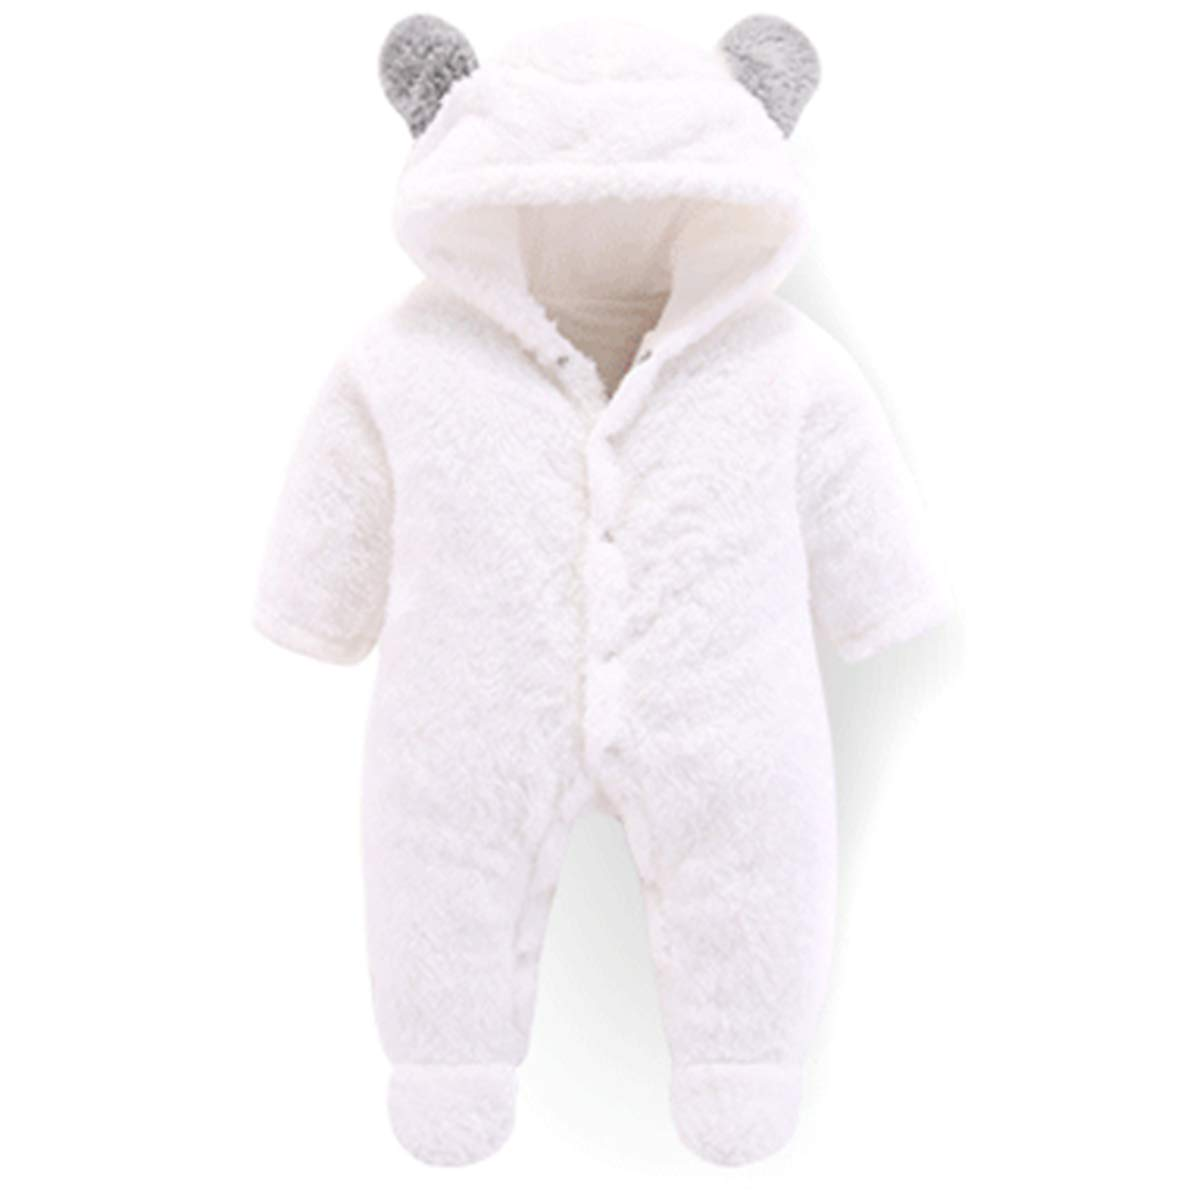 Traje de Nieve c/álido para beb/é Oso Mono de Mameluco con Capucha de Felpa de algod/ón para ni/ñas ni/ño Haokaini